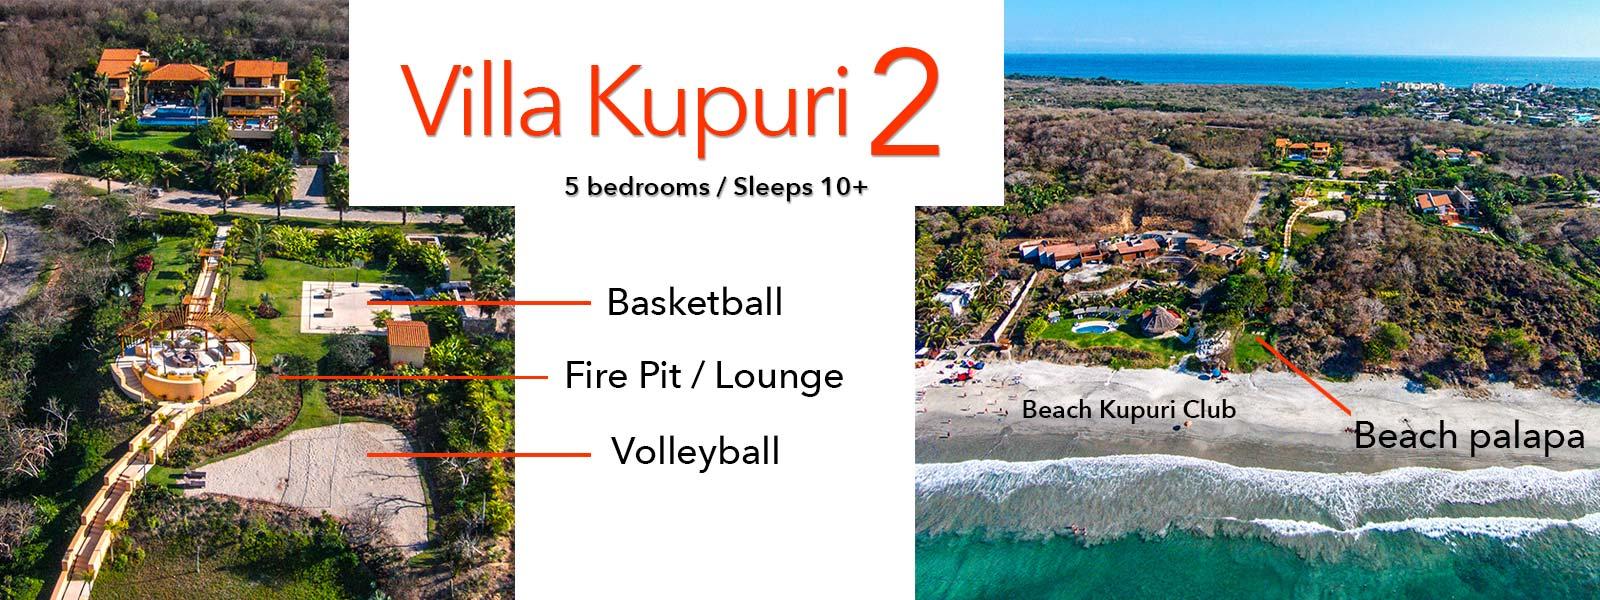 Villa Kupuri 2 - Luxury Vacation Rental Villa at the Punta Mita Resort, Riviera Nayarit, Mexico